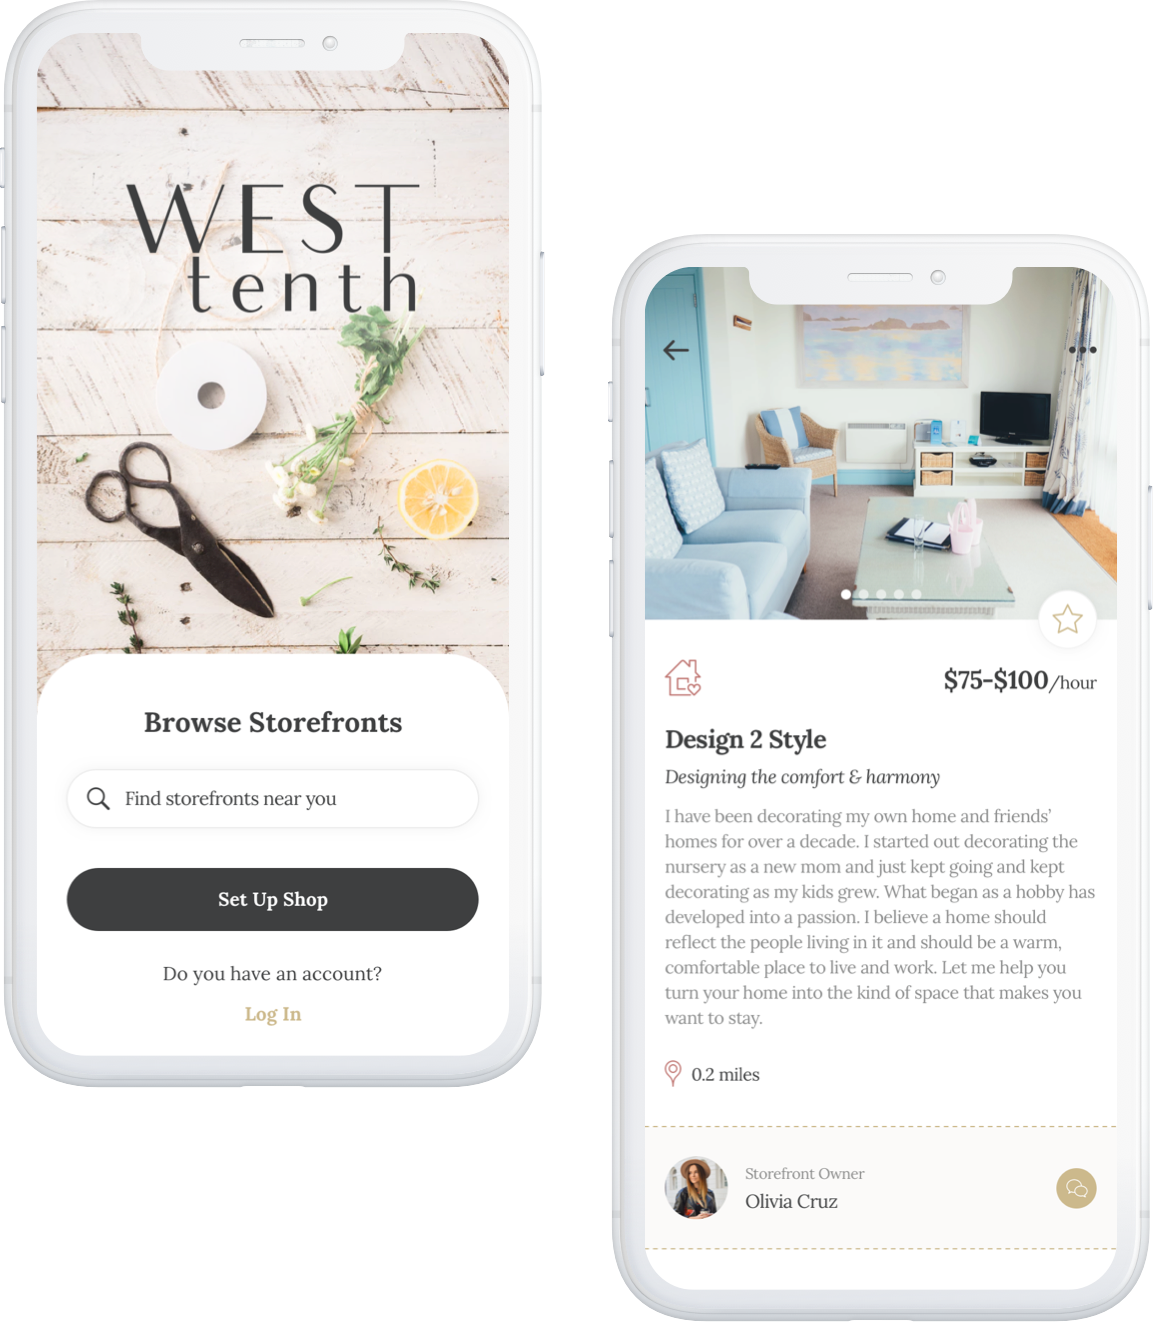 West Tenth App mockups: Browse Storefronts, Set Up Shop, Request a Service